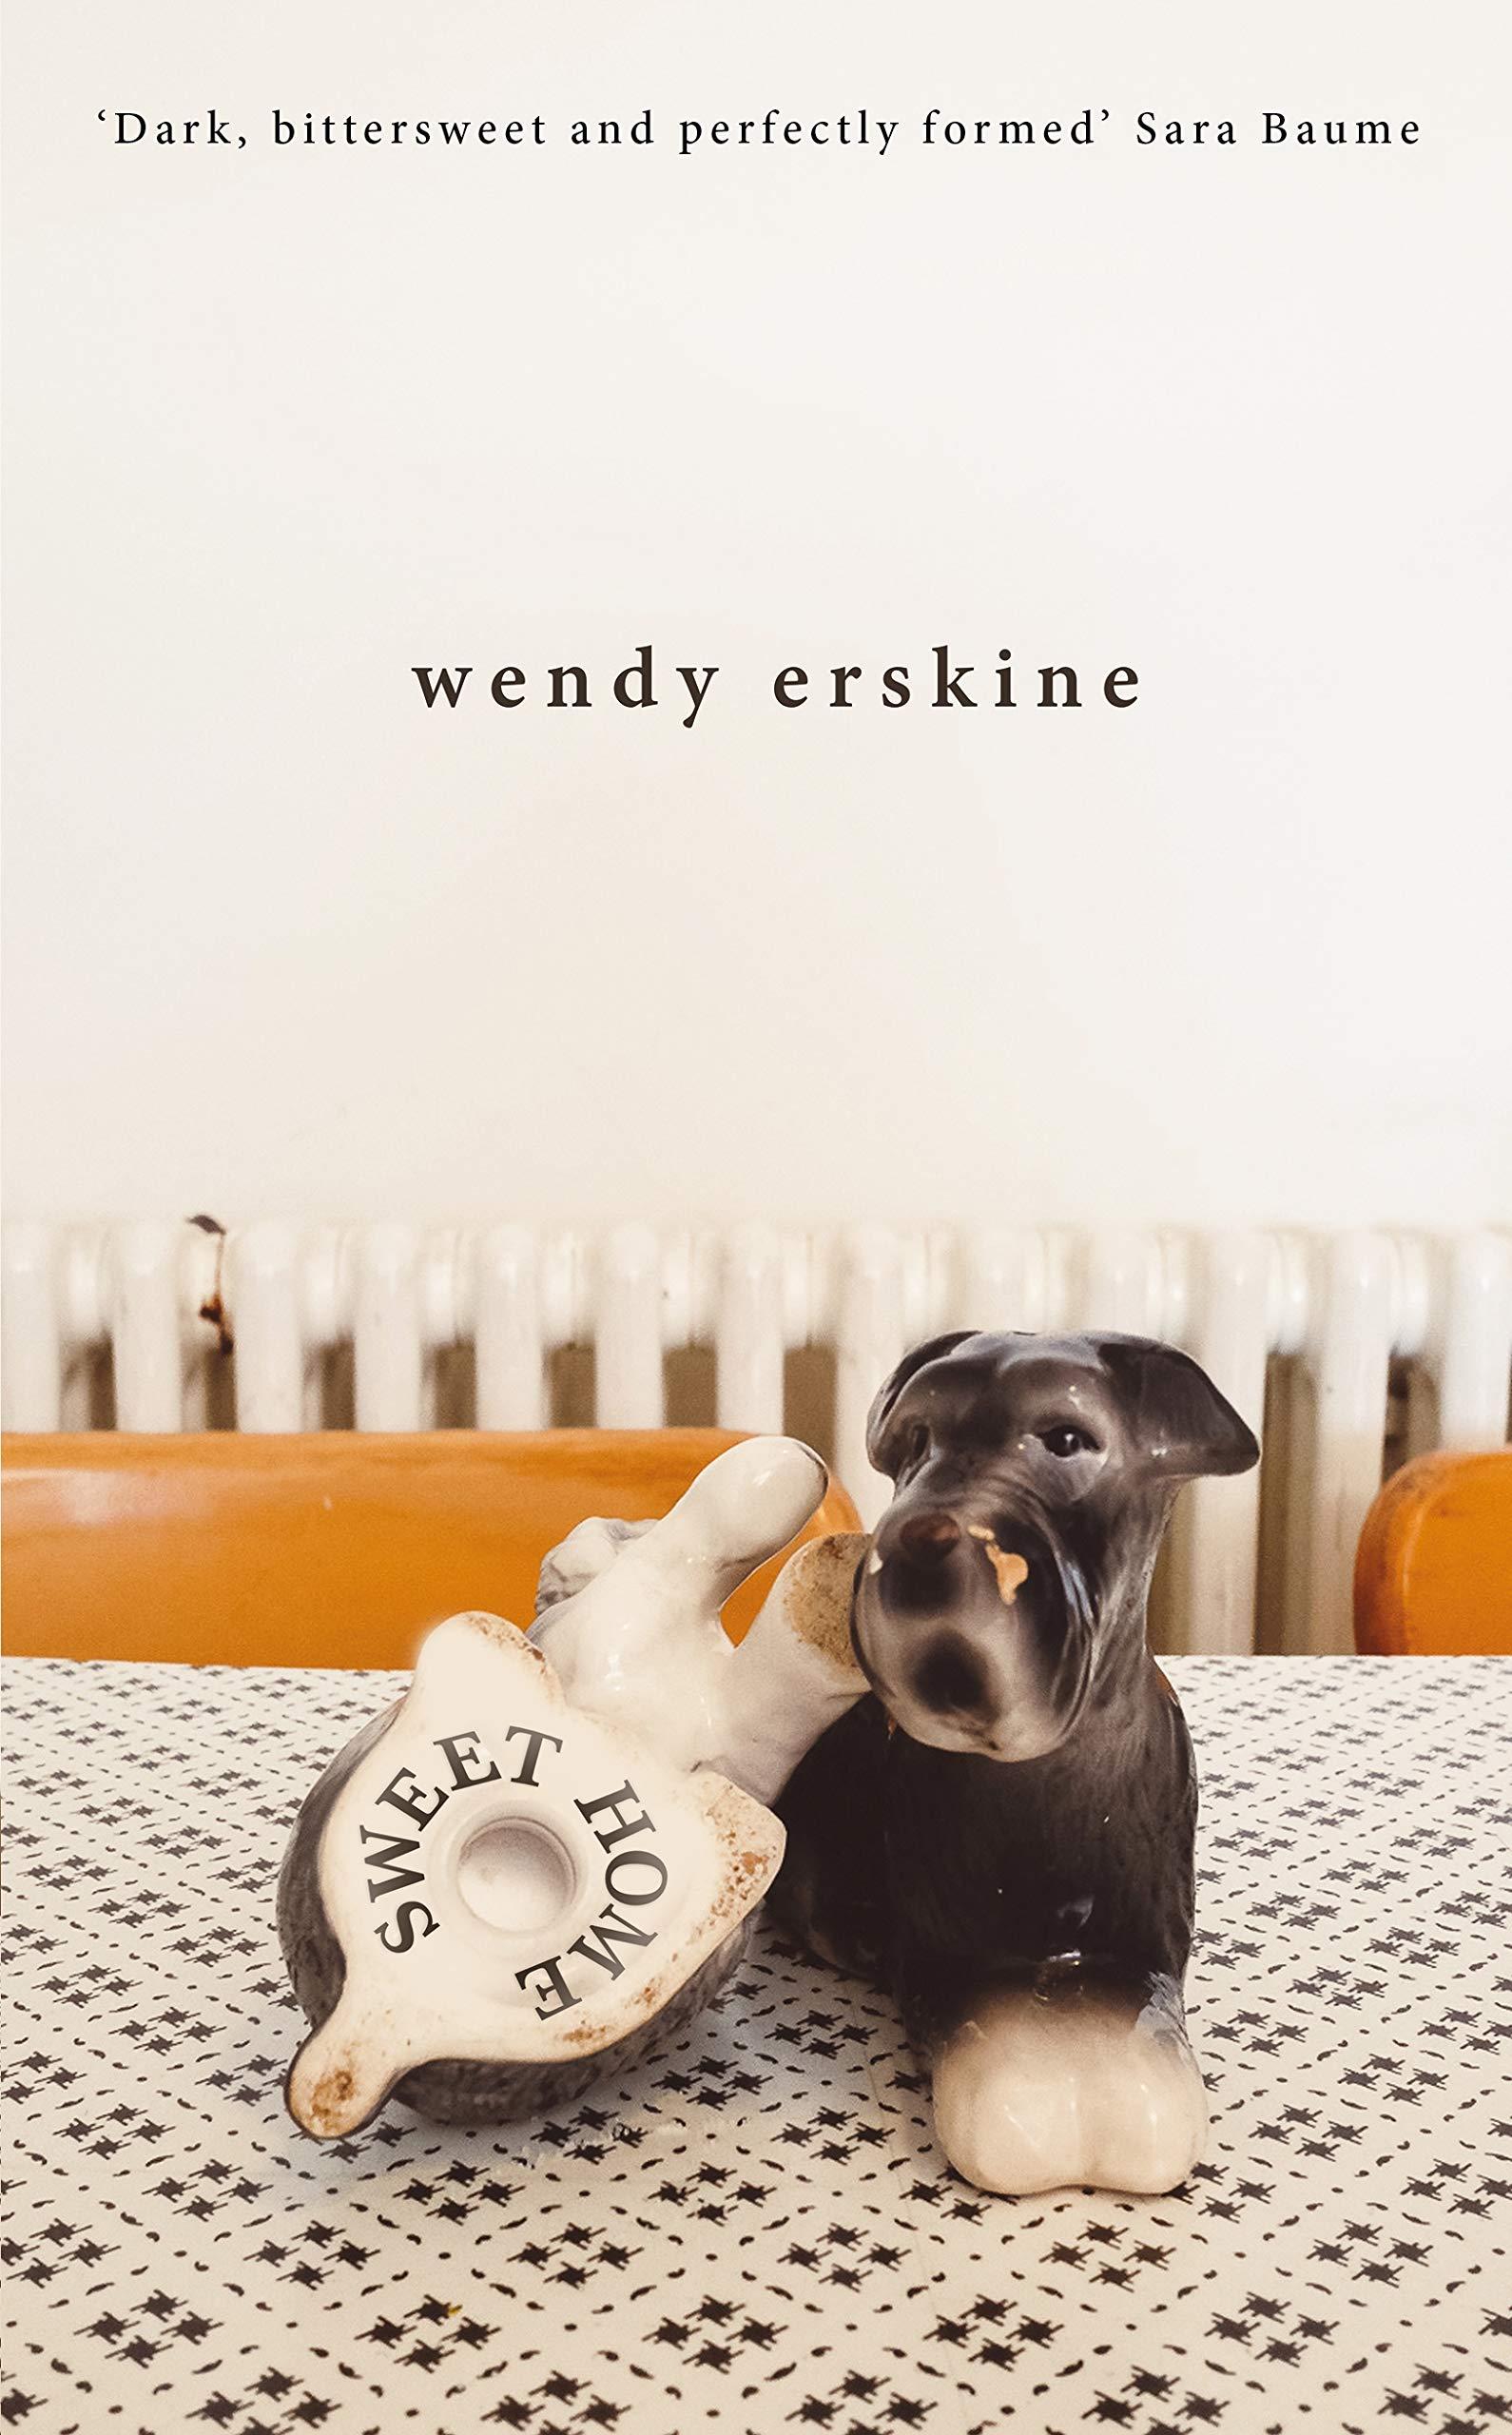 Amazon.com: Sweet Home (9781529017069): Erskine, Wendy: Books